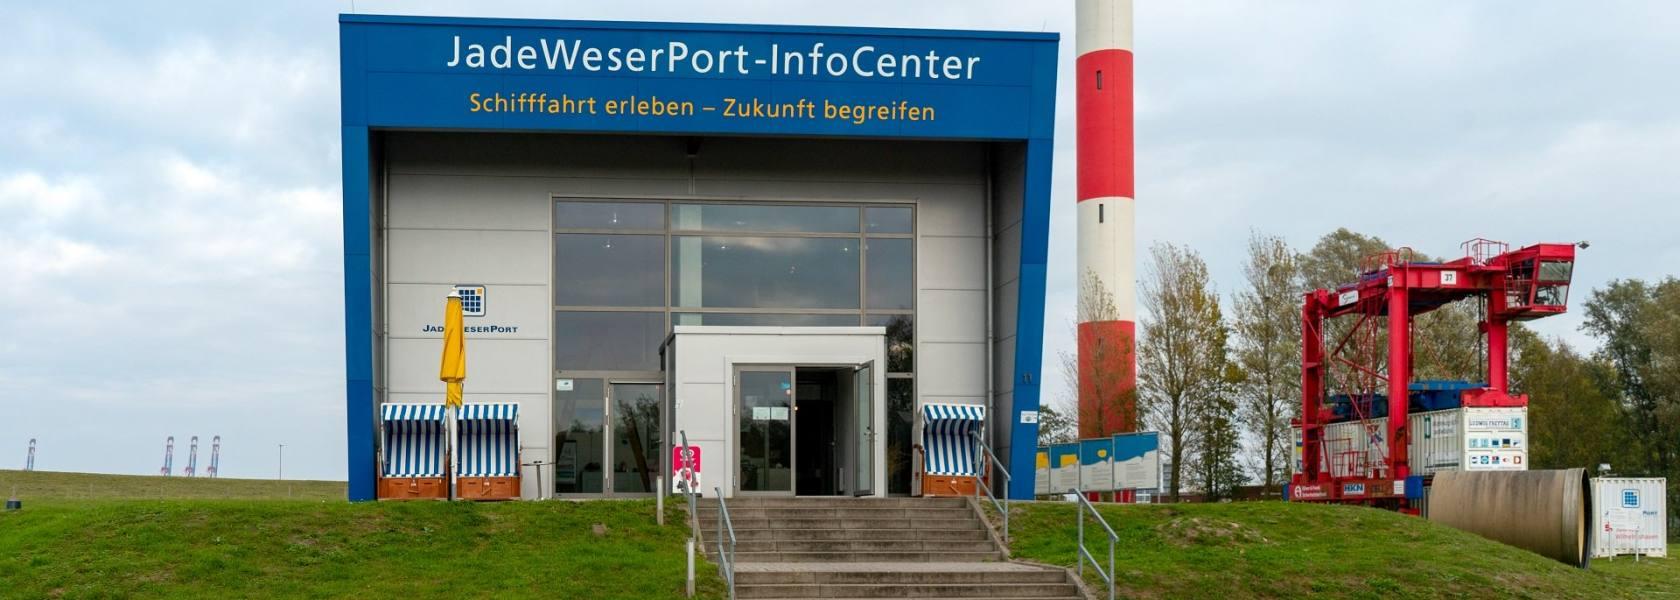 JadeWeserPort-InfoCenter, © Rainer Ganske